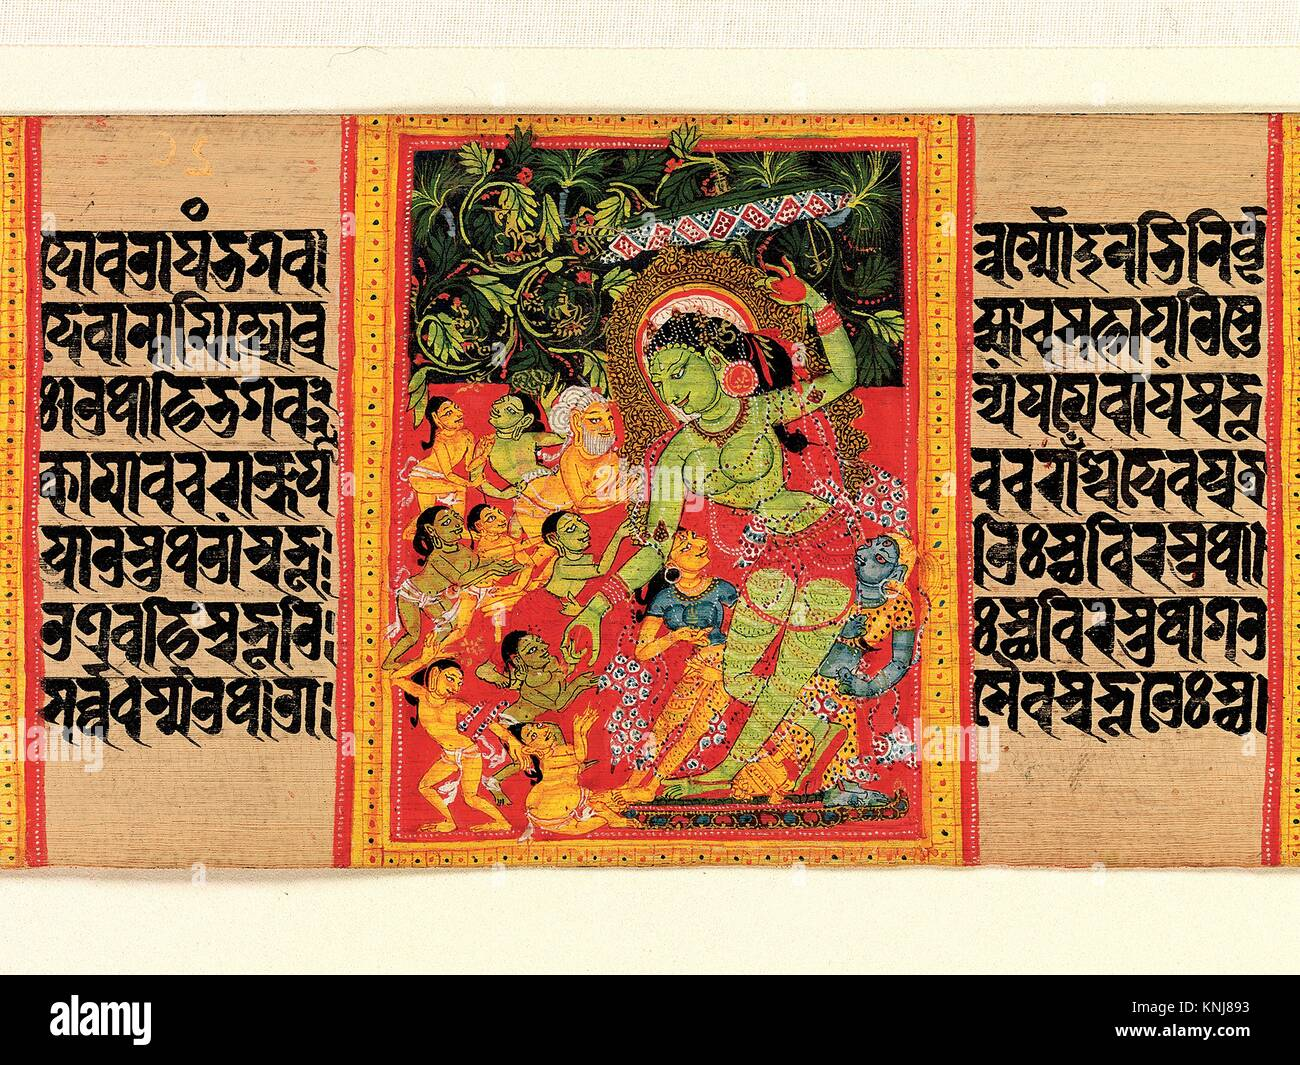 Green Tara Dispensing Boons to Ecstatic Devotees: Folio from a Manuscript of the Ashtasahasrika Prajnaparamita (Perfection - Stock Image